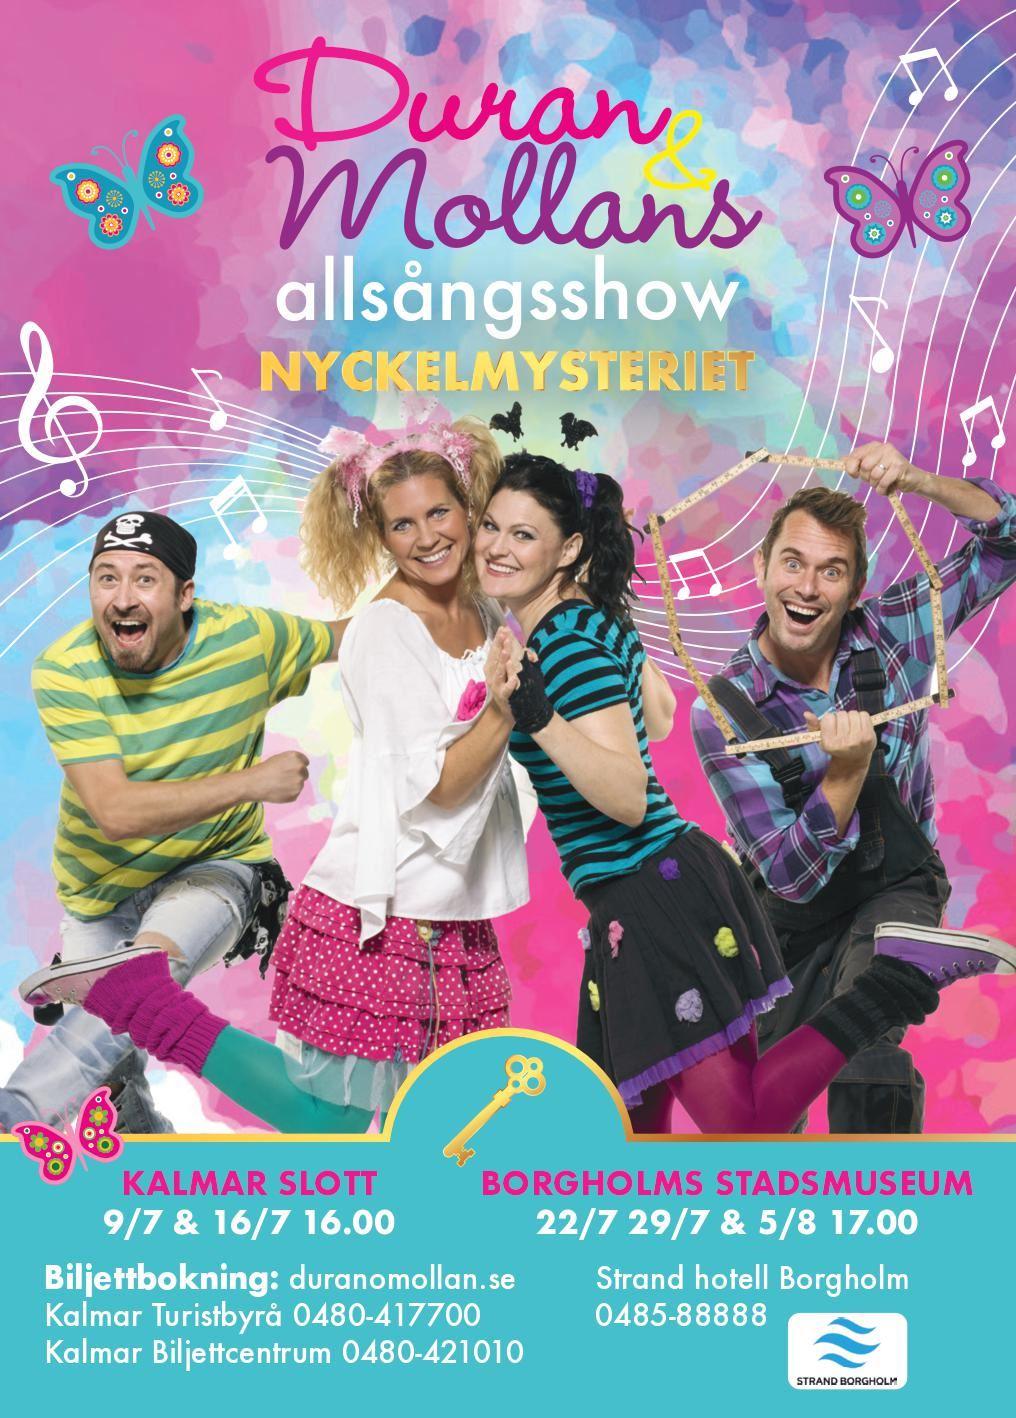 Duran & Mollans allsångsshow - Nyckelmysteriet